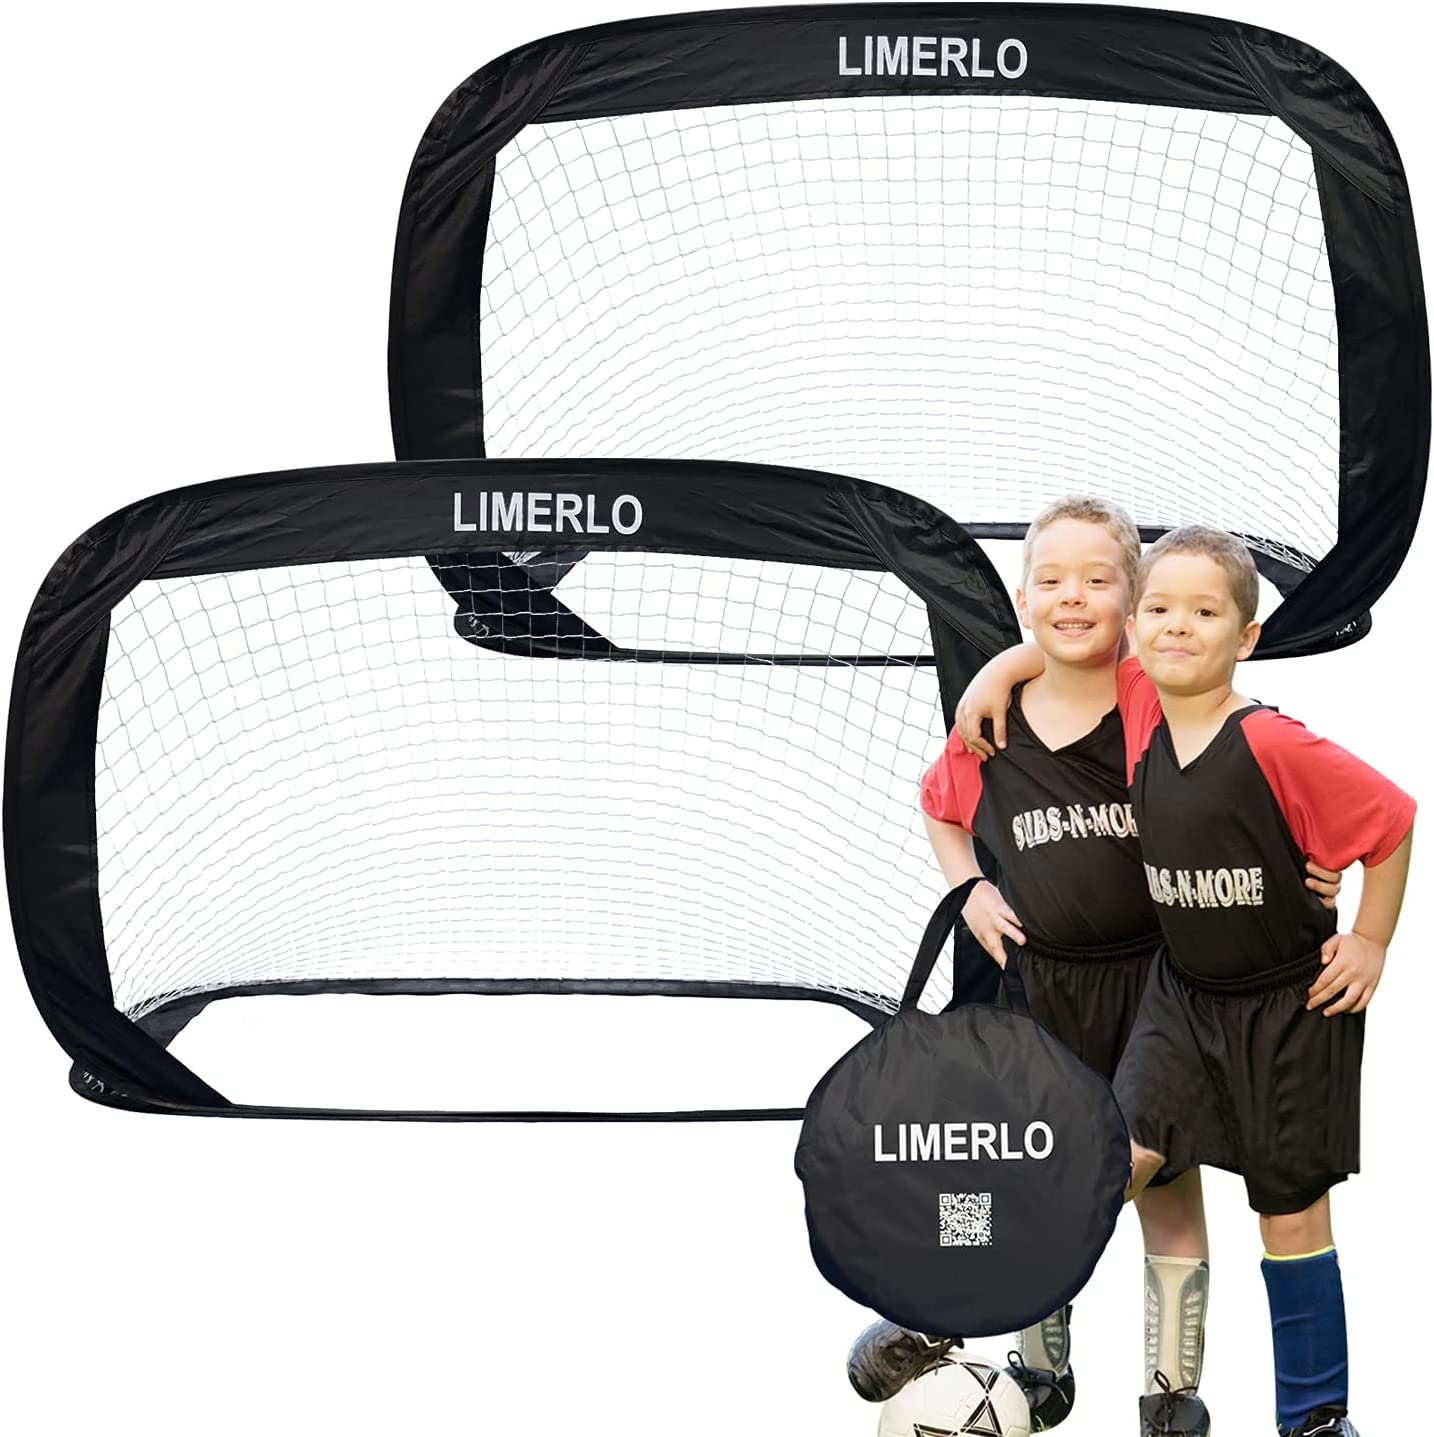 limerlo Portable Pop Dealing full price reduction Up Soccer Foldabl Brand Cheap Sale Venue - Goals Net Kids